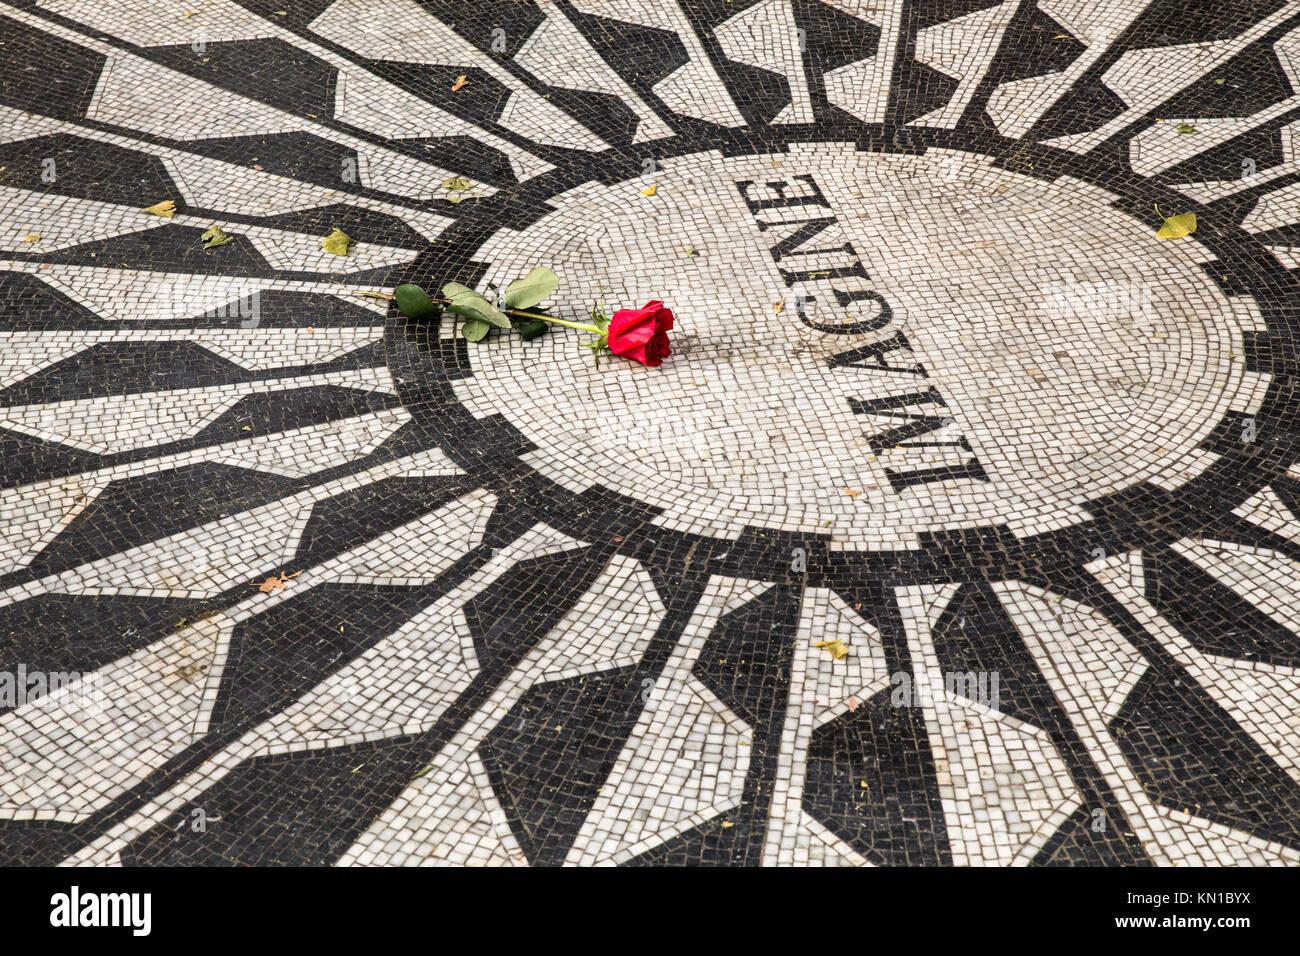 Imagine memorial de John Lennon en Central Park, NYC, Strawberry Fields Foto de stock